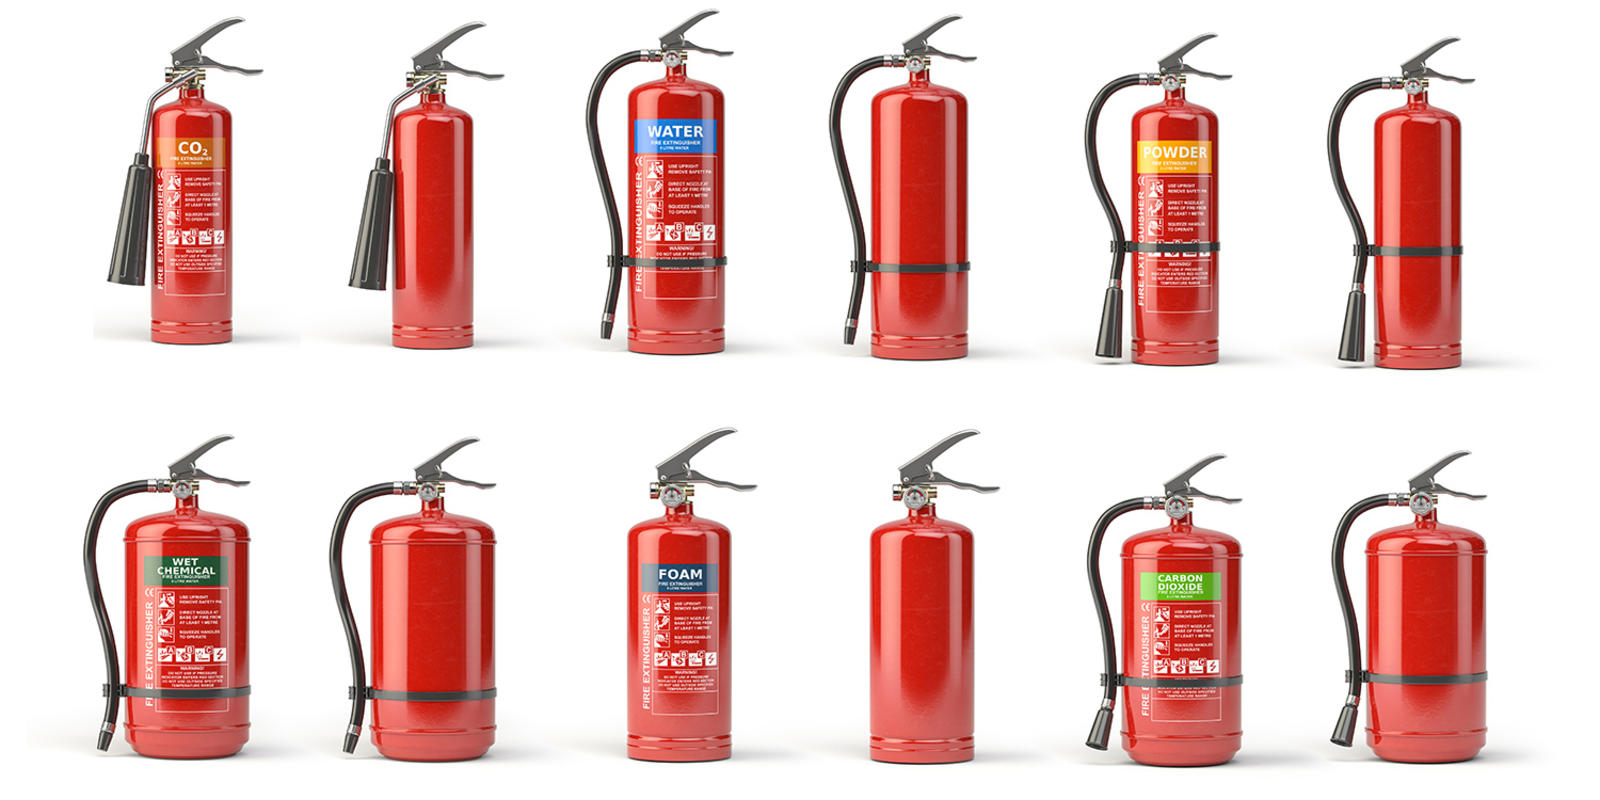 Brandblusser keuren